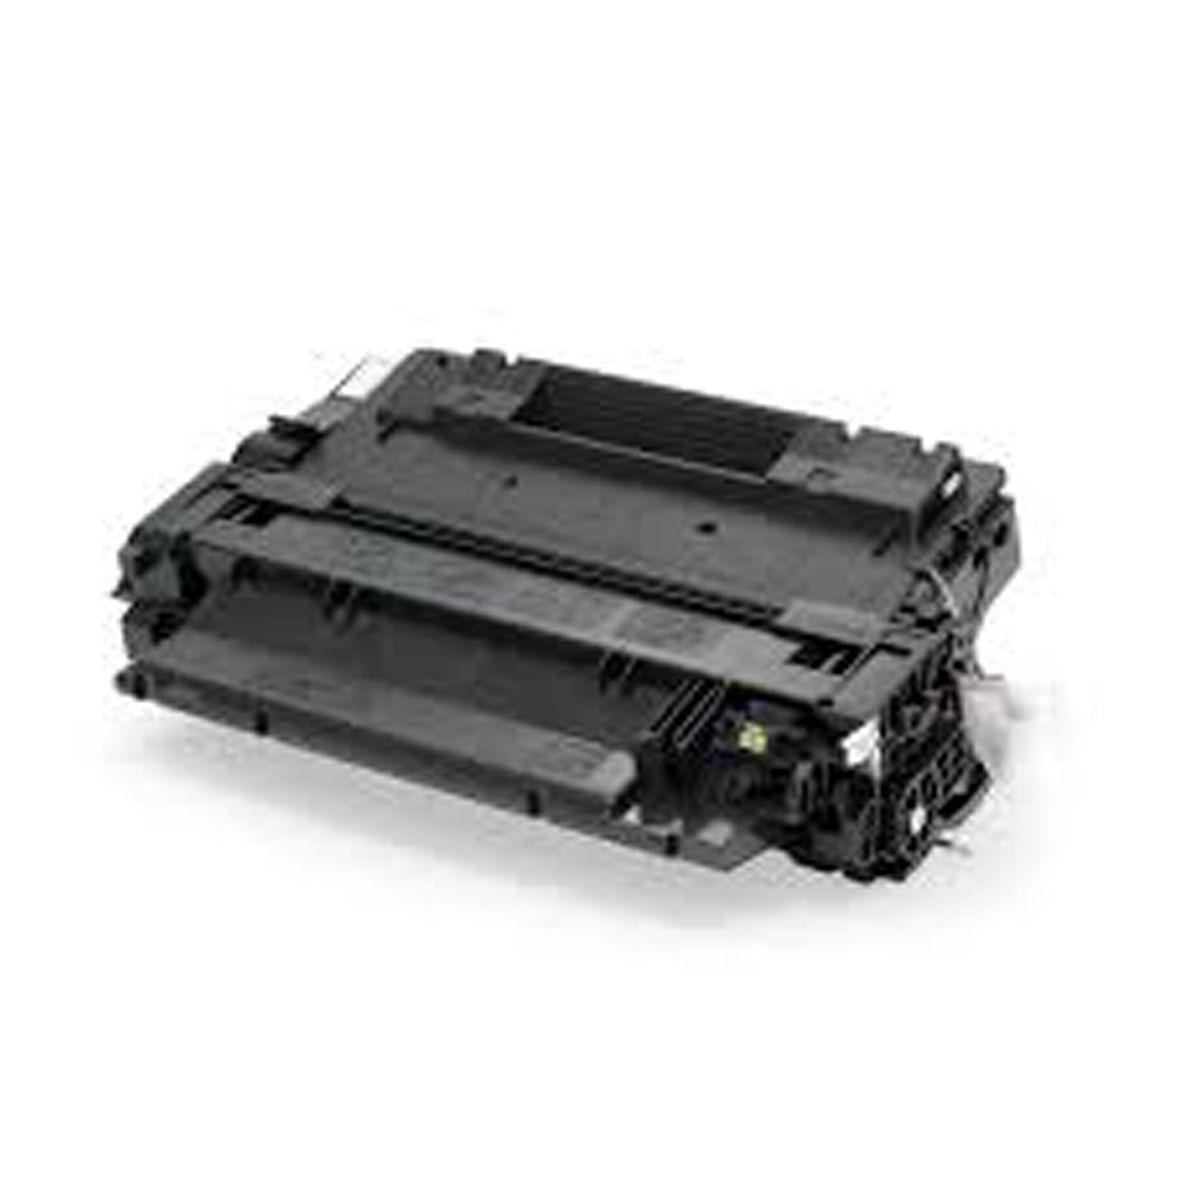 Toner Q7551A 7551 - P3005 P3005DN P3005D P3005N M3035 M3027 6k